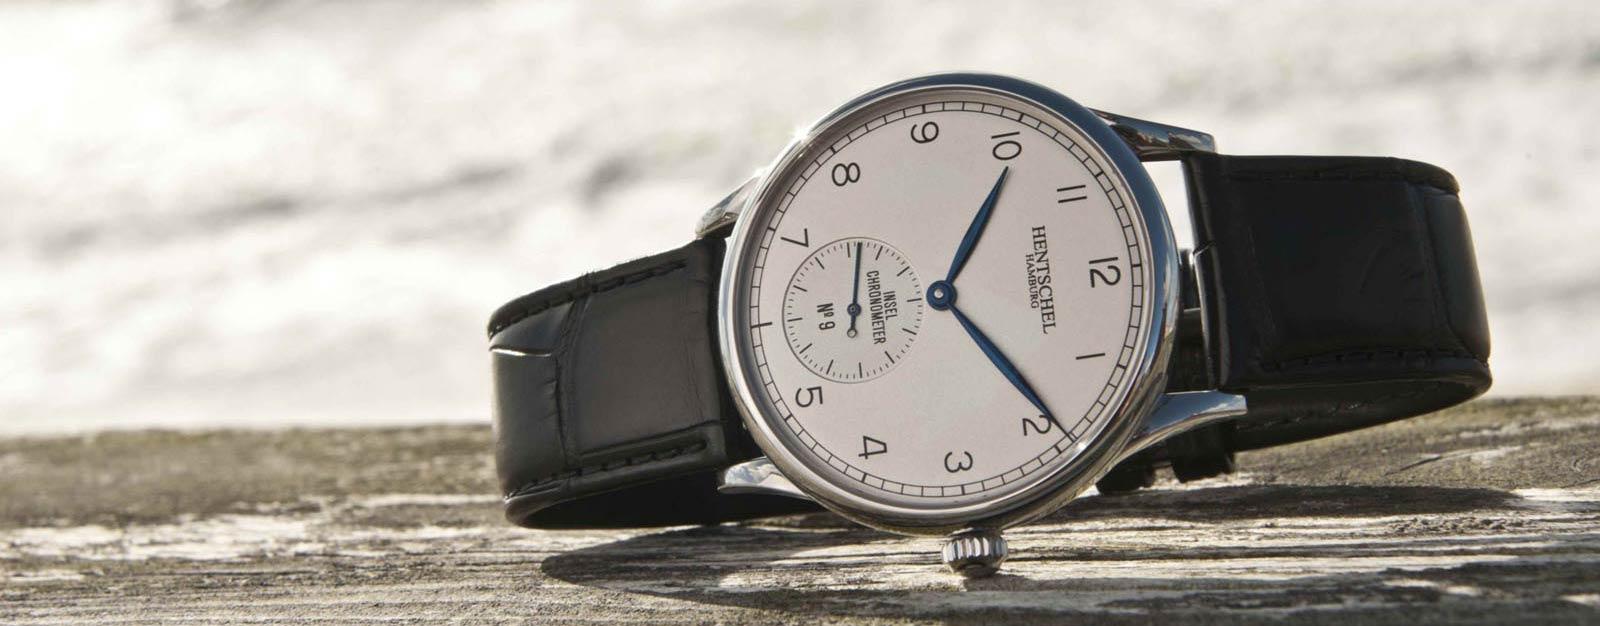 inselchronometer03-1600x1065